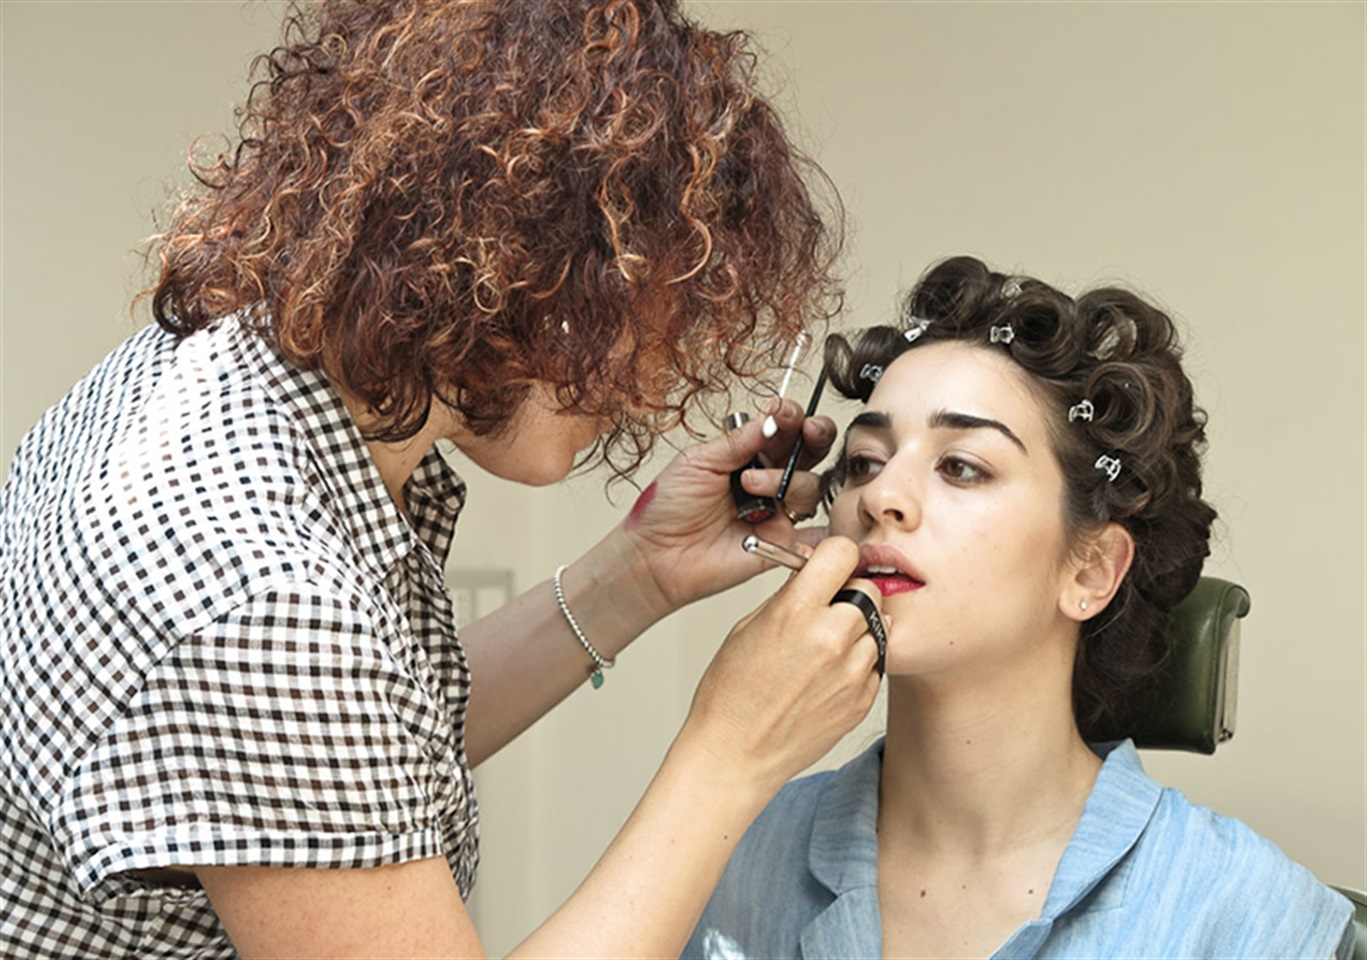 Intervista Ad Ambra Angiolini E Simona Tabasco Glamour It